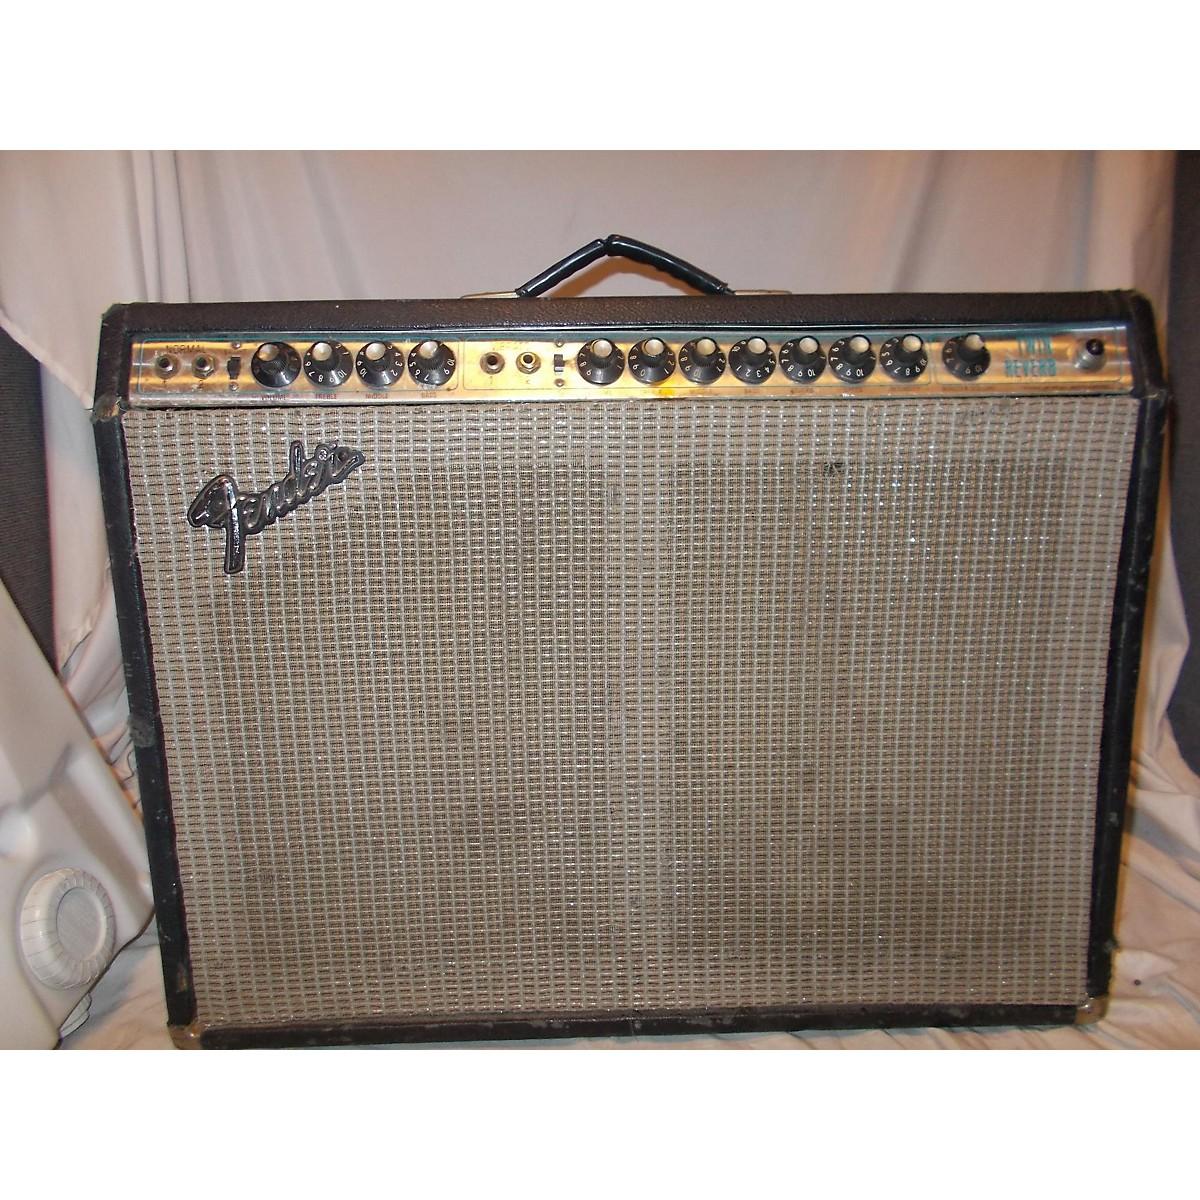 Fender 1974 Twin Reverb 2x12 Tube Guitar Combo Amp